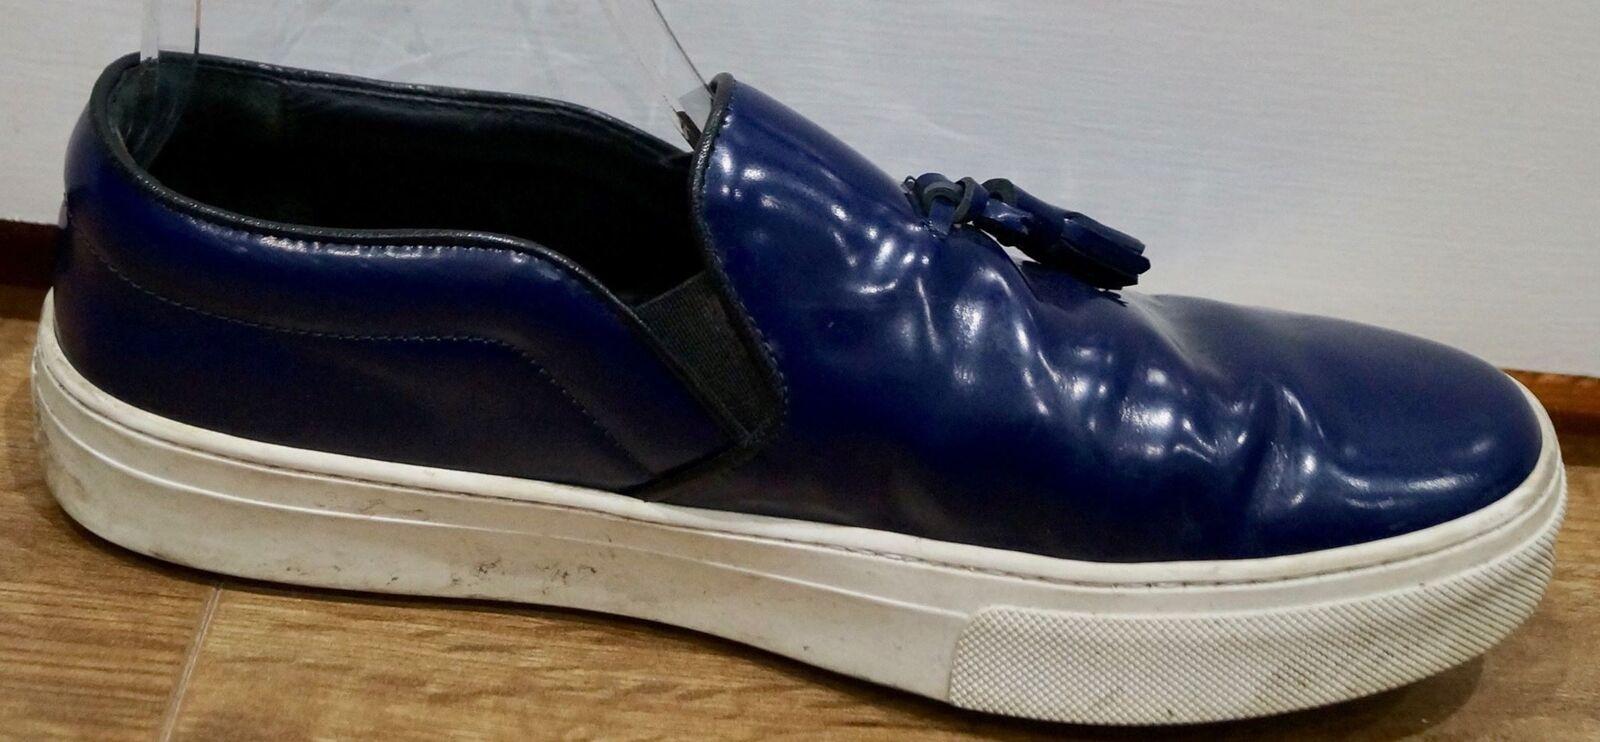 CELINE PARIS Blau Leder Sneakers Tassel Front Weiß Rubber Sole Casual Sneakers Leder Trainer 4a5bde